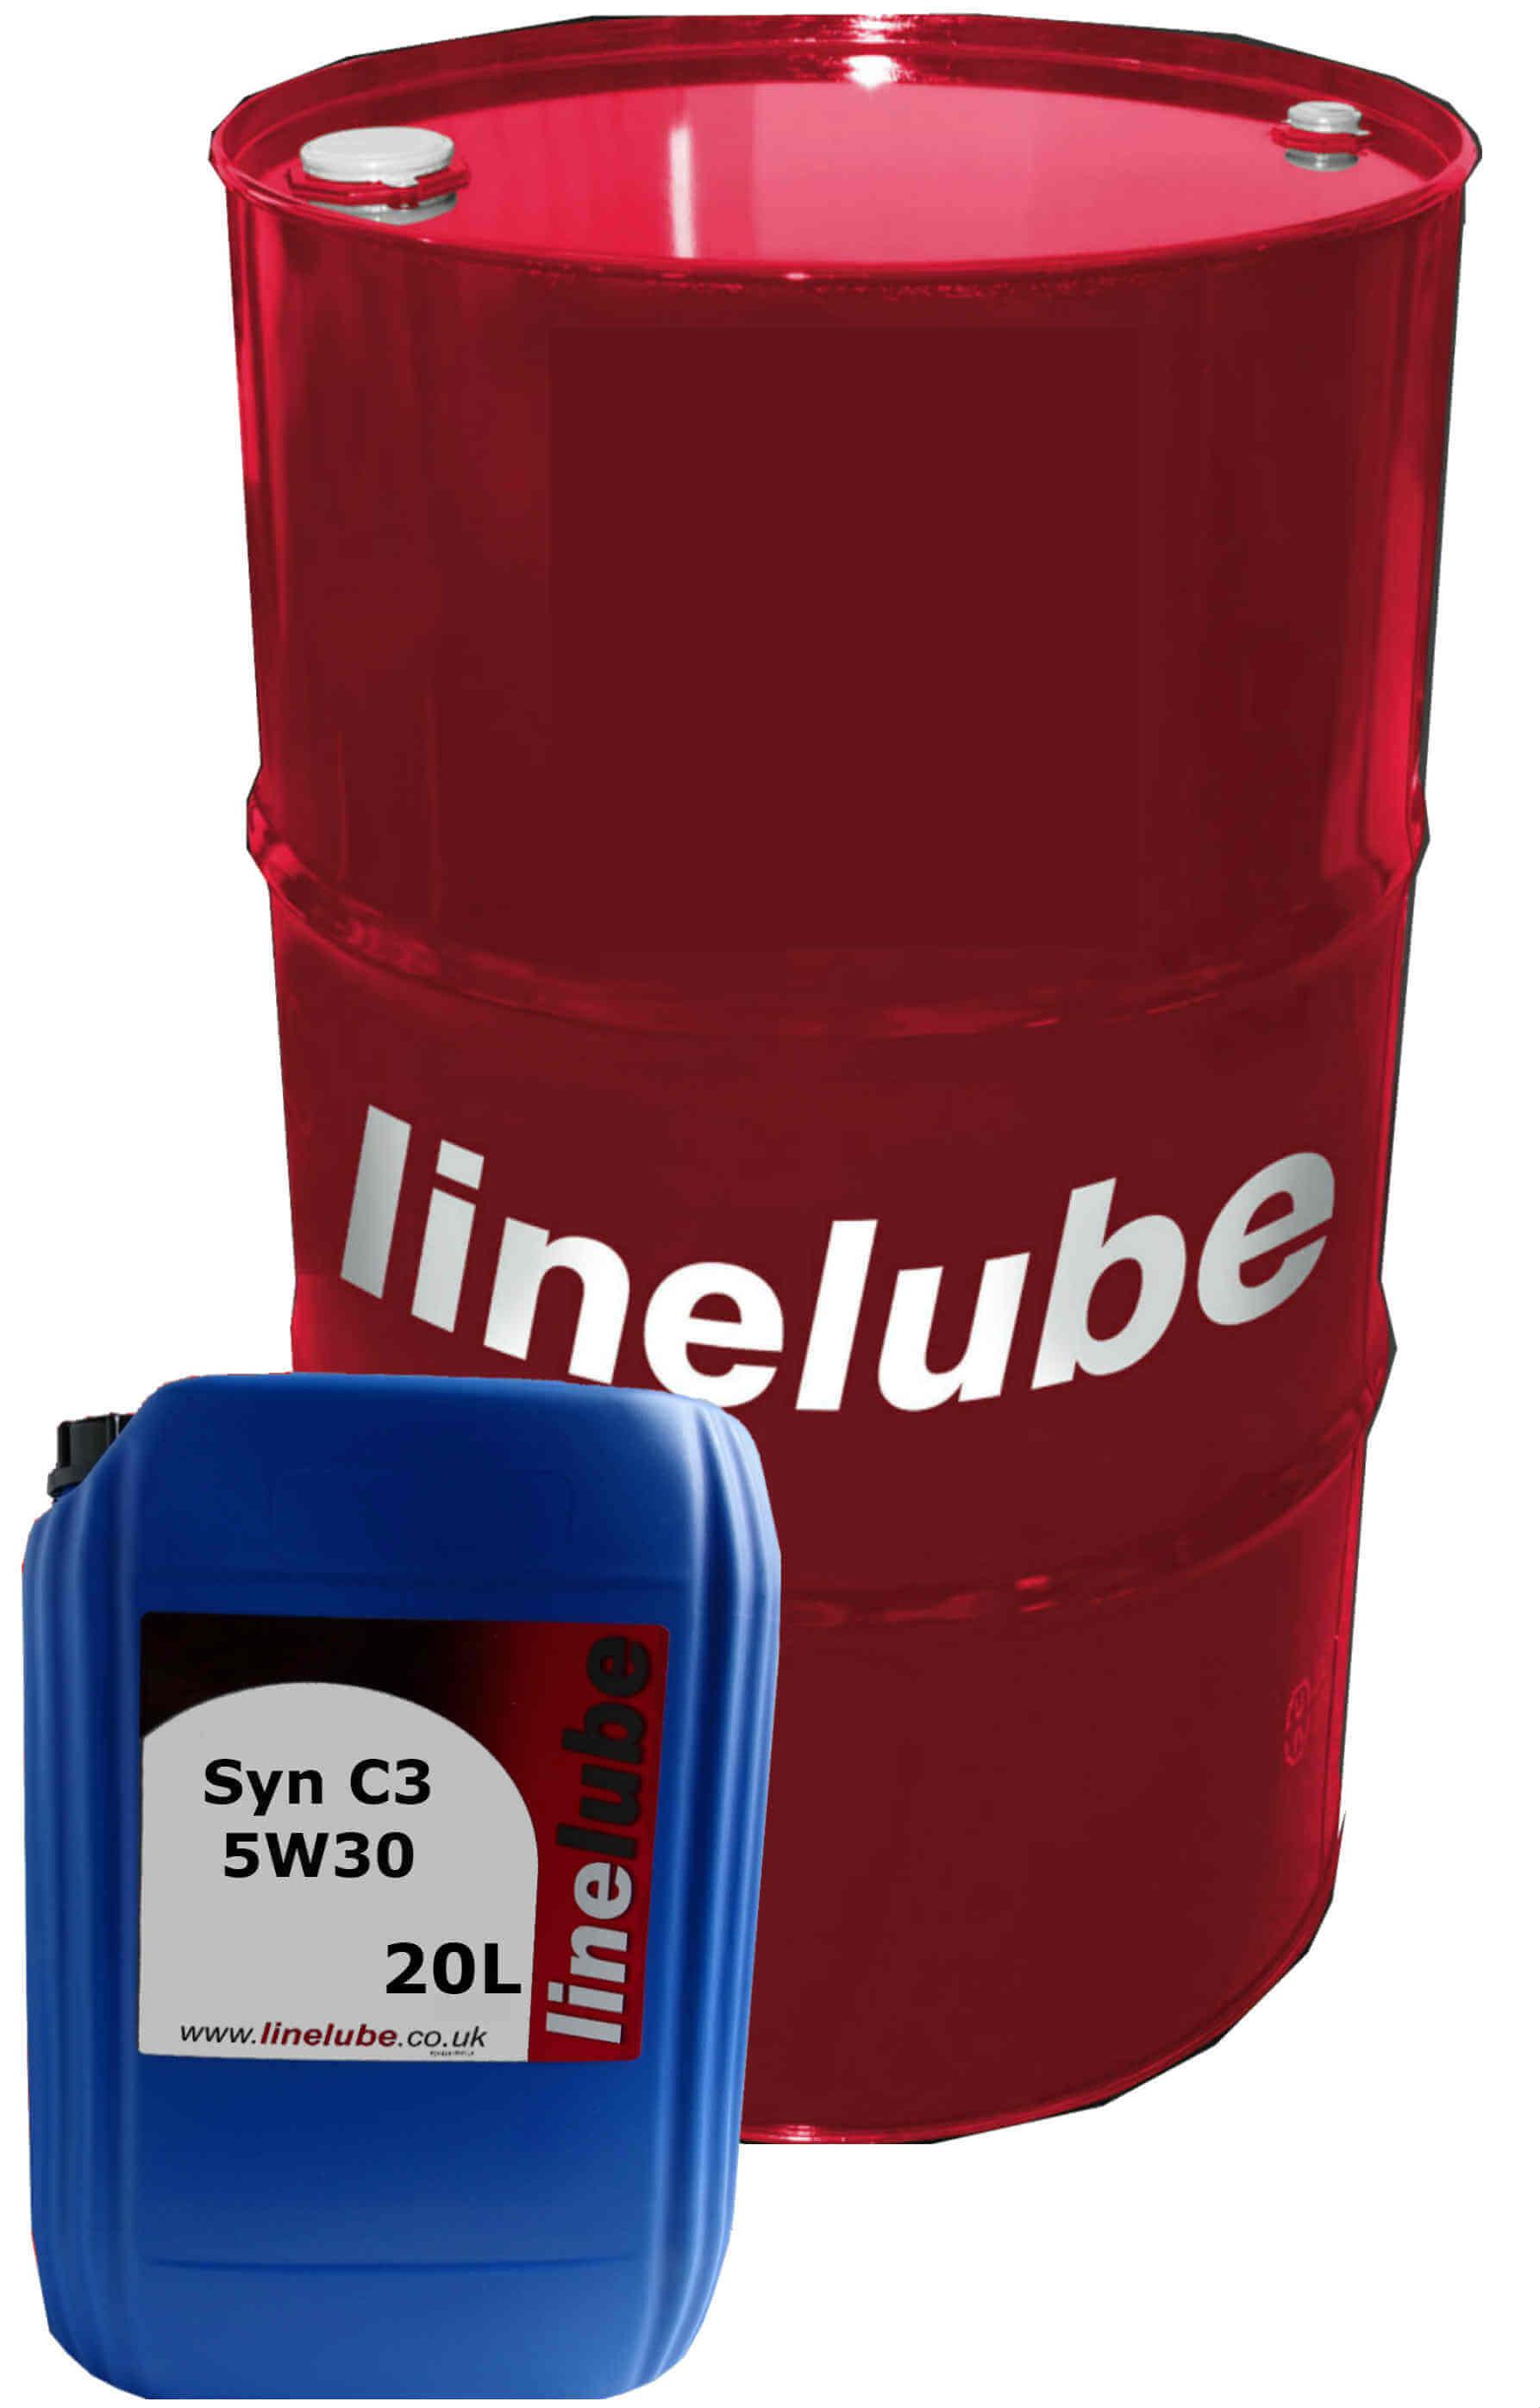 Linelube Syn C3 5W-30